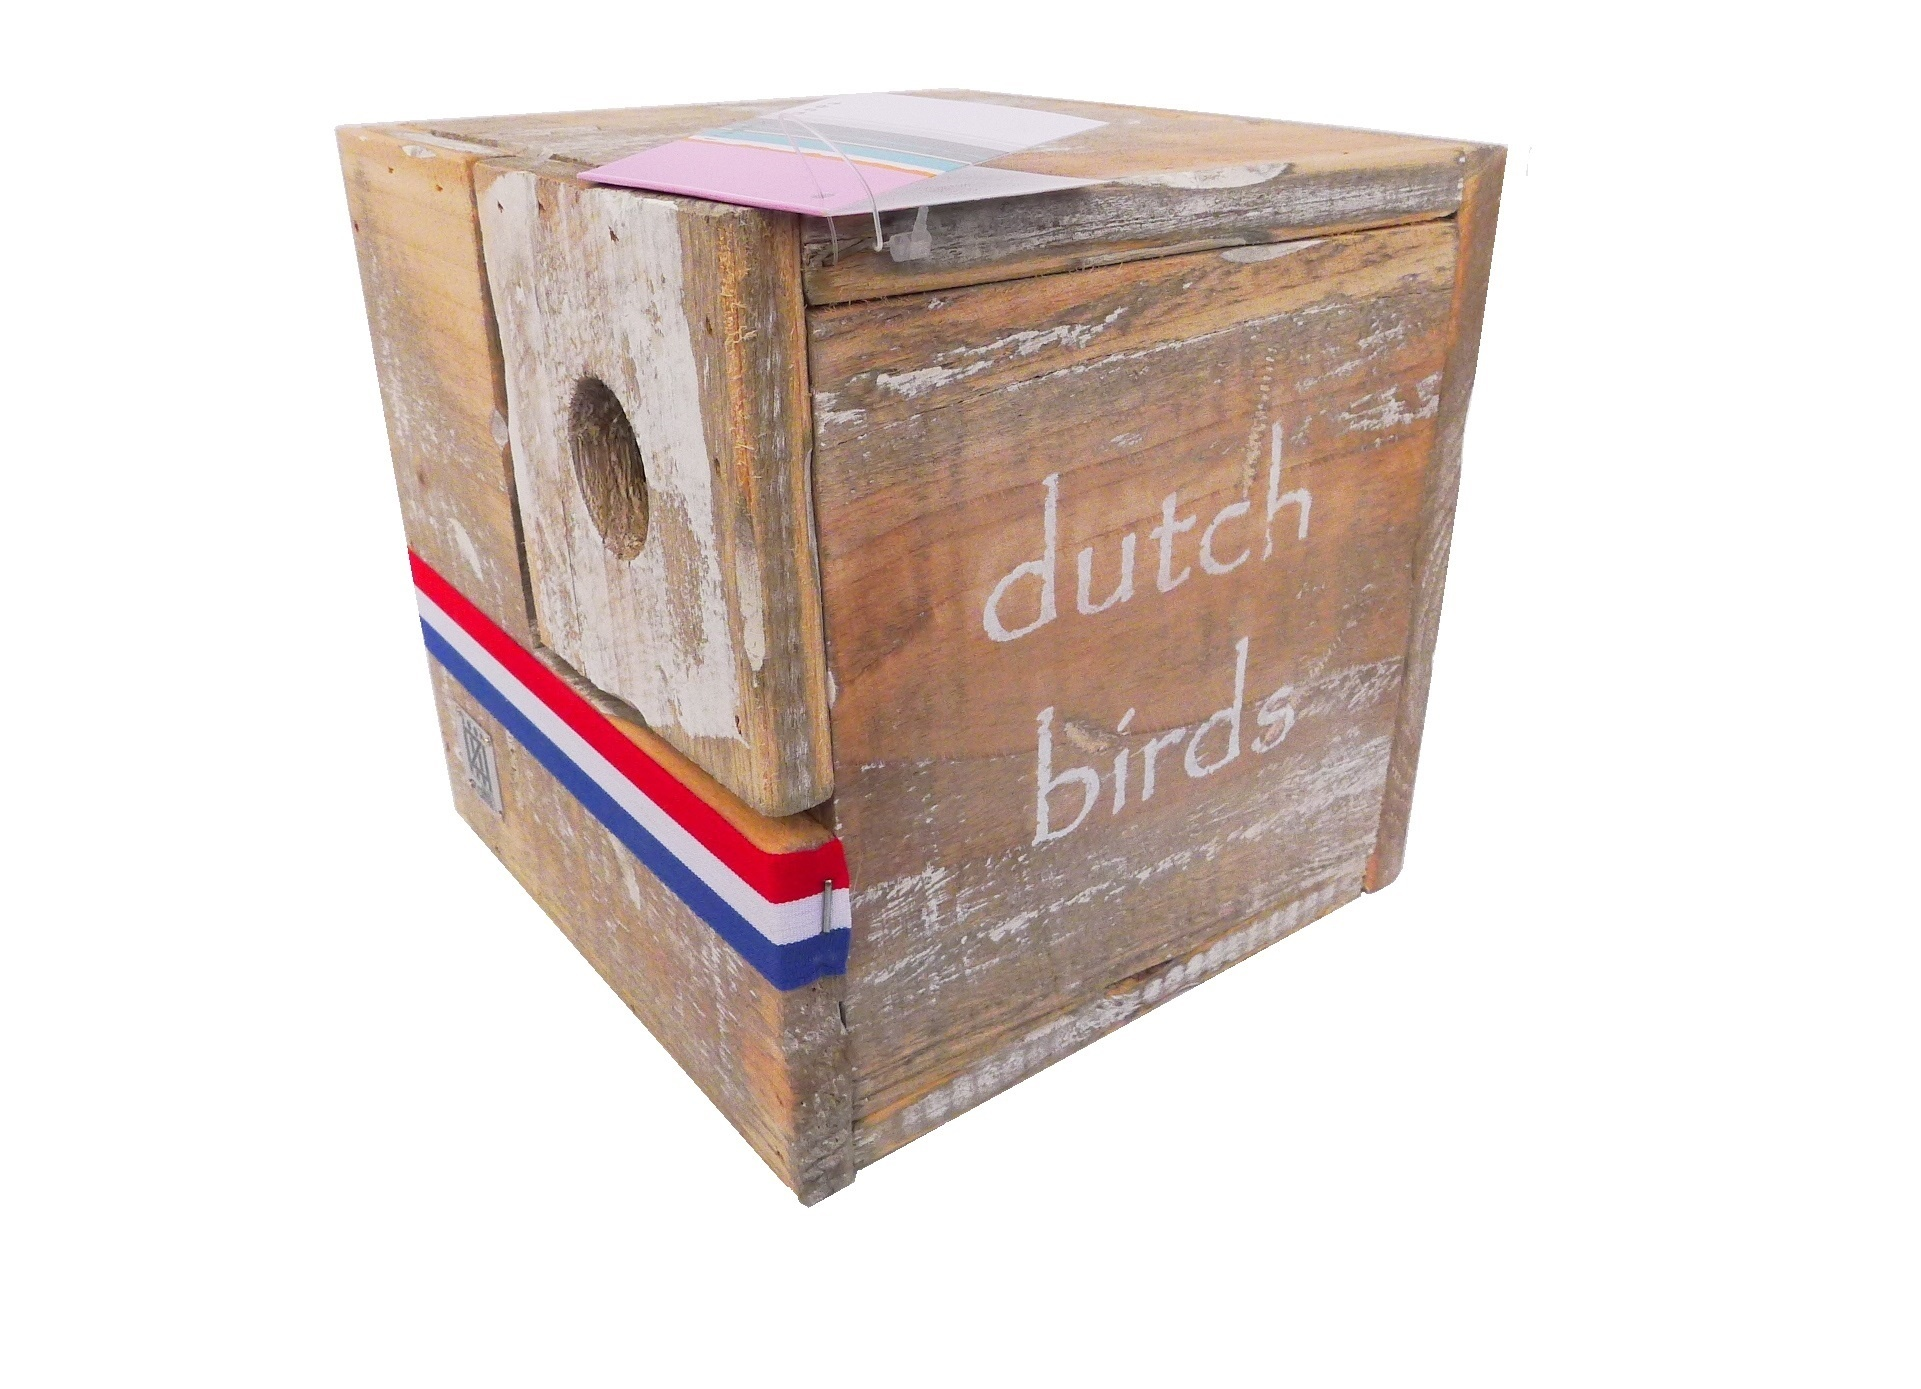 birdhouse old dutch StB square-9